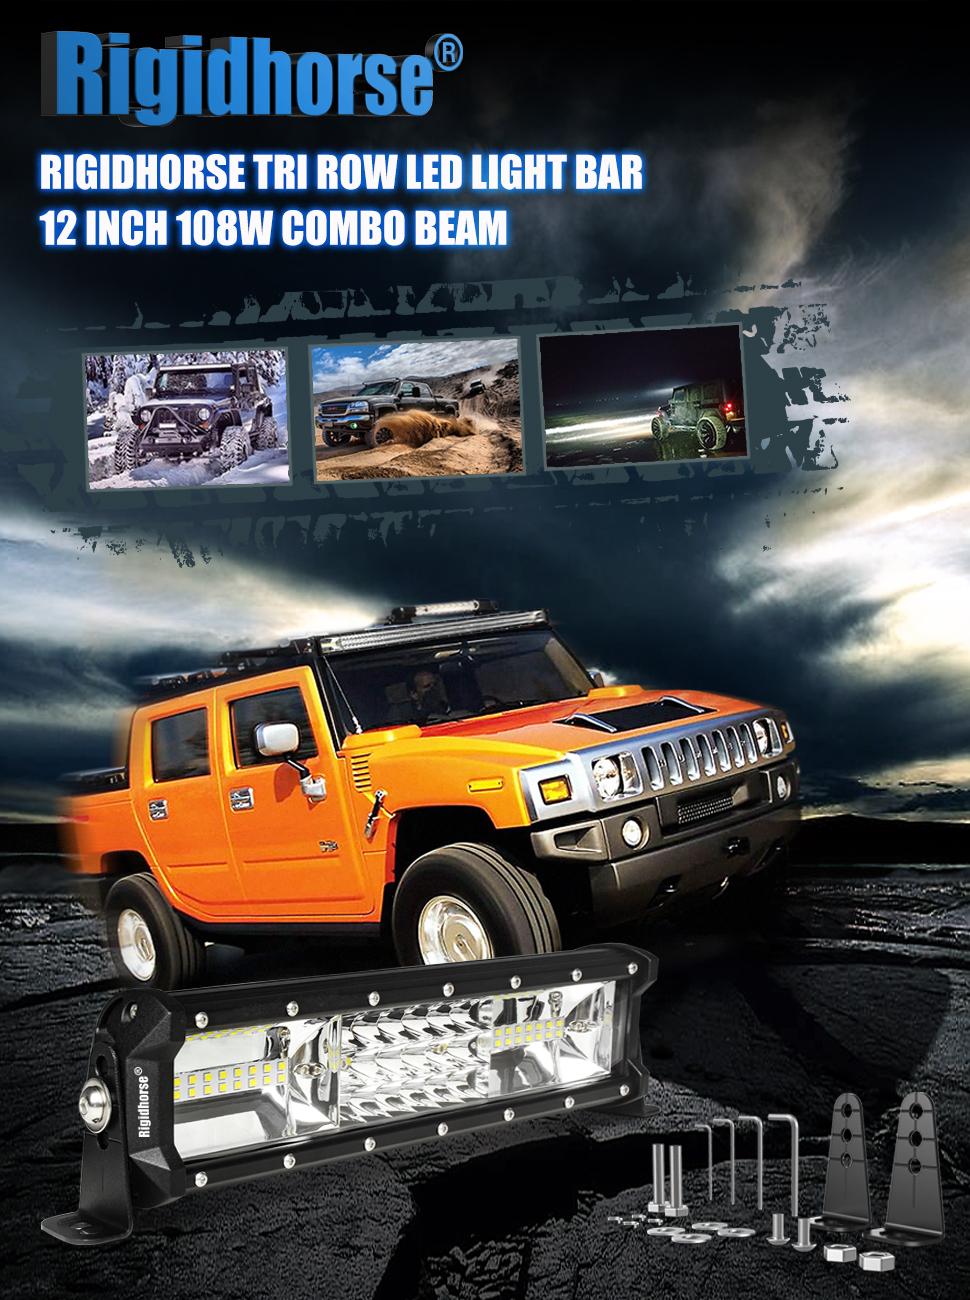 Led Light Bar Rigidhorse Triple Row 12 Inch 108w 96 Hummer Wiring Diagram Product Description